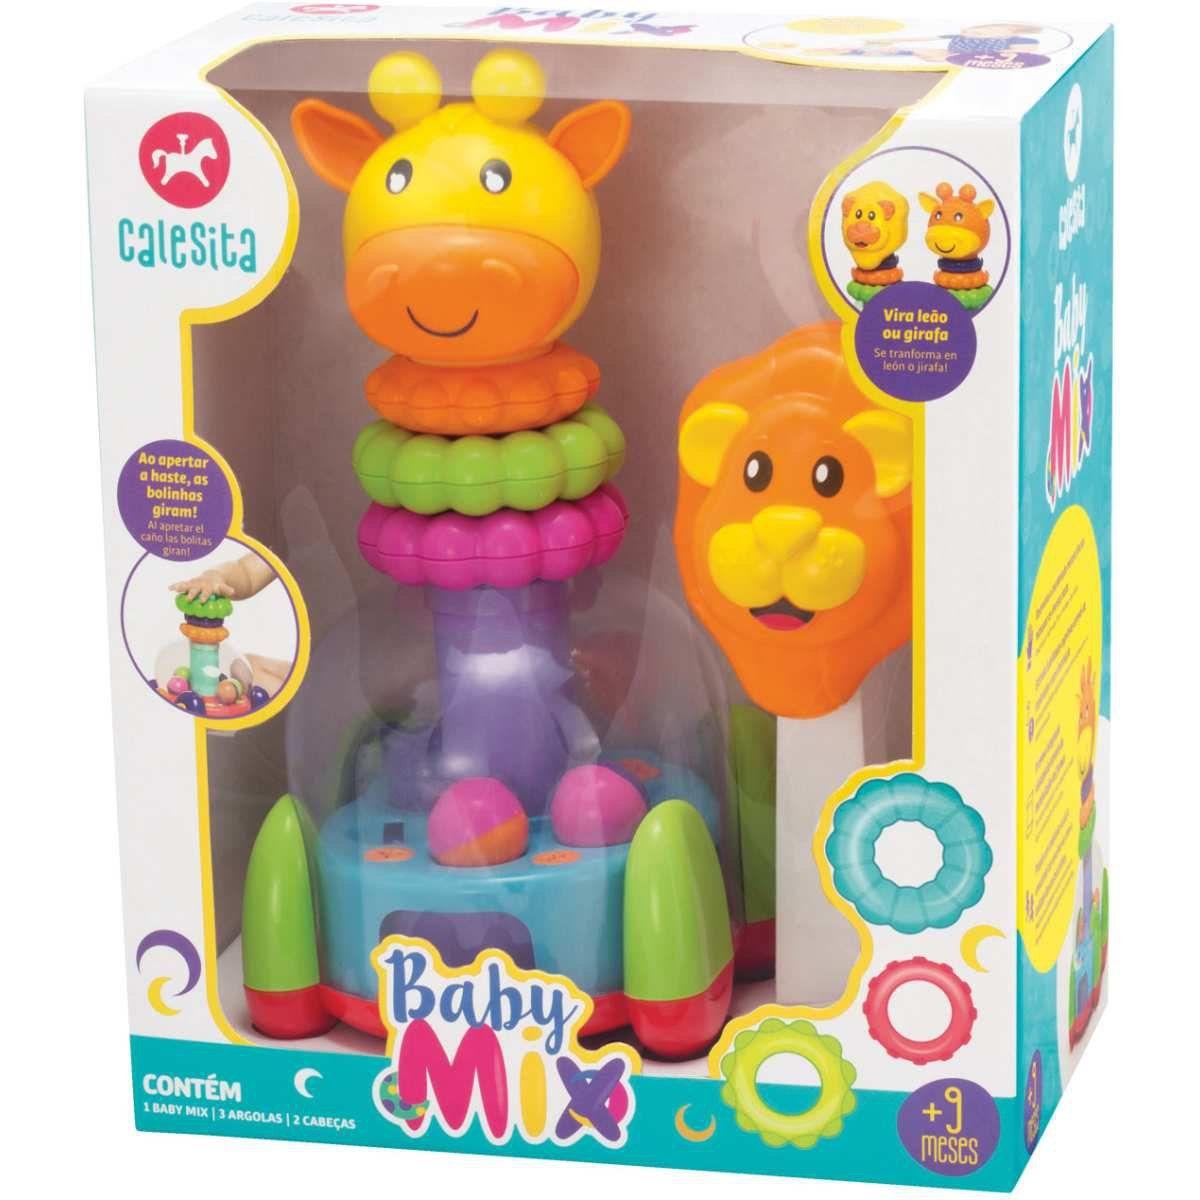 Brinquedo Educativo Baby Mix Leão E Girafa - Calesita 863